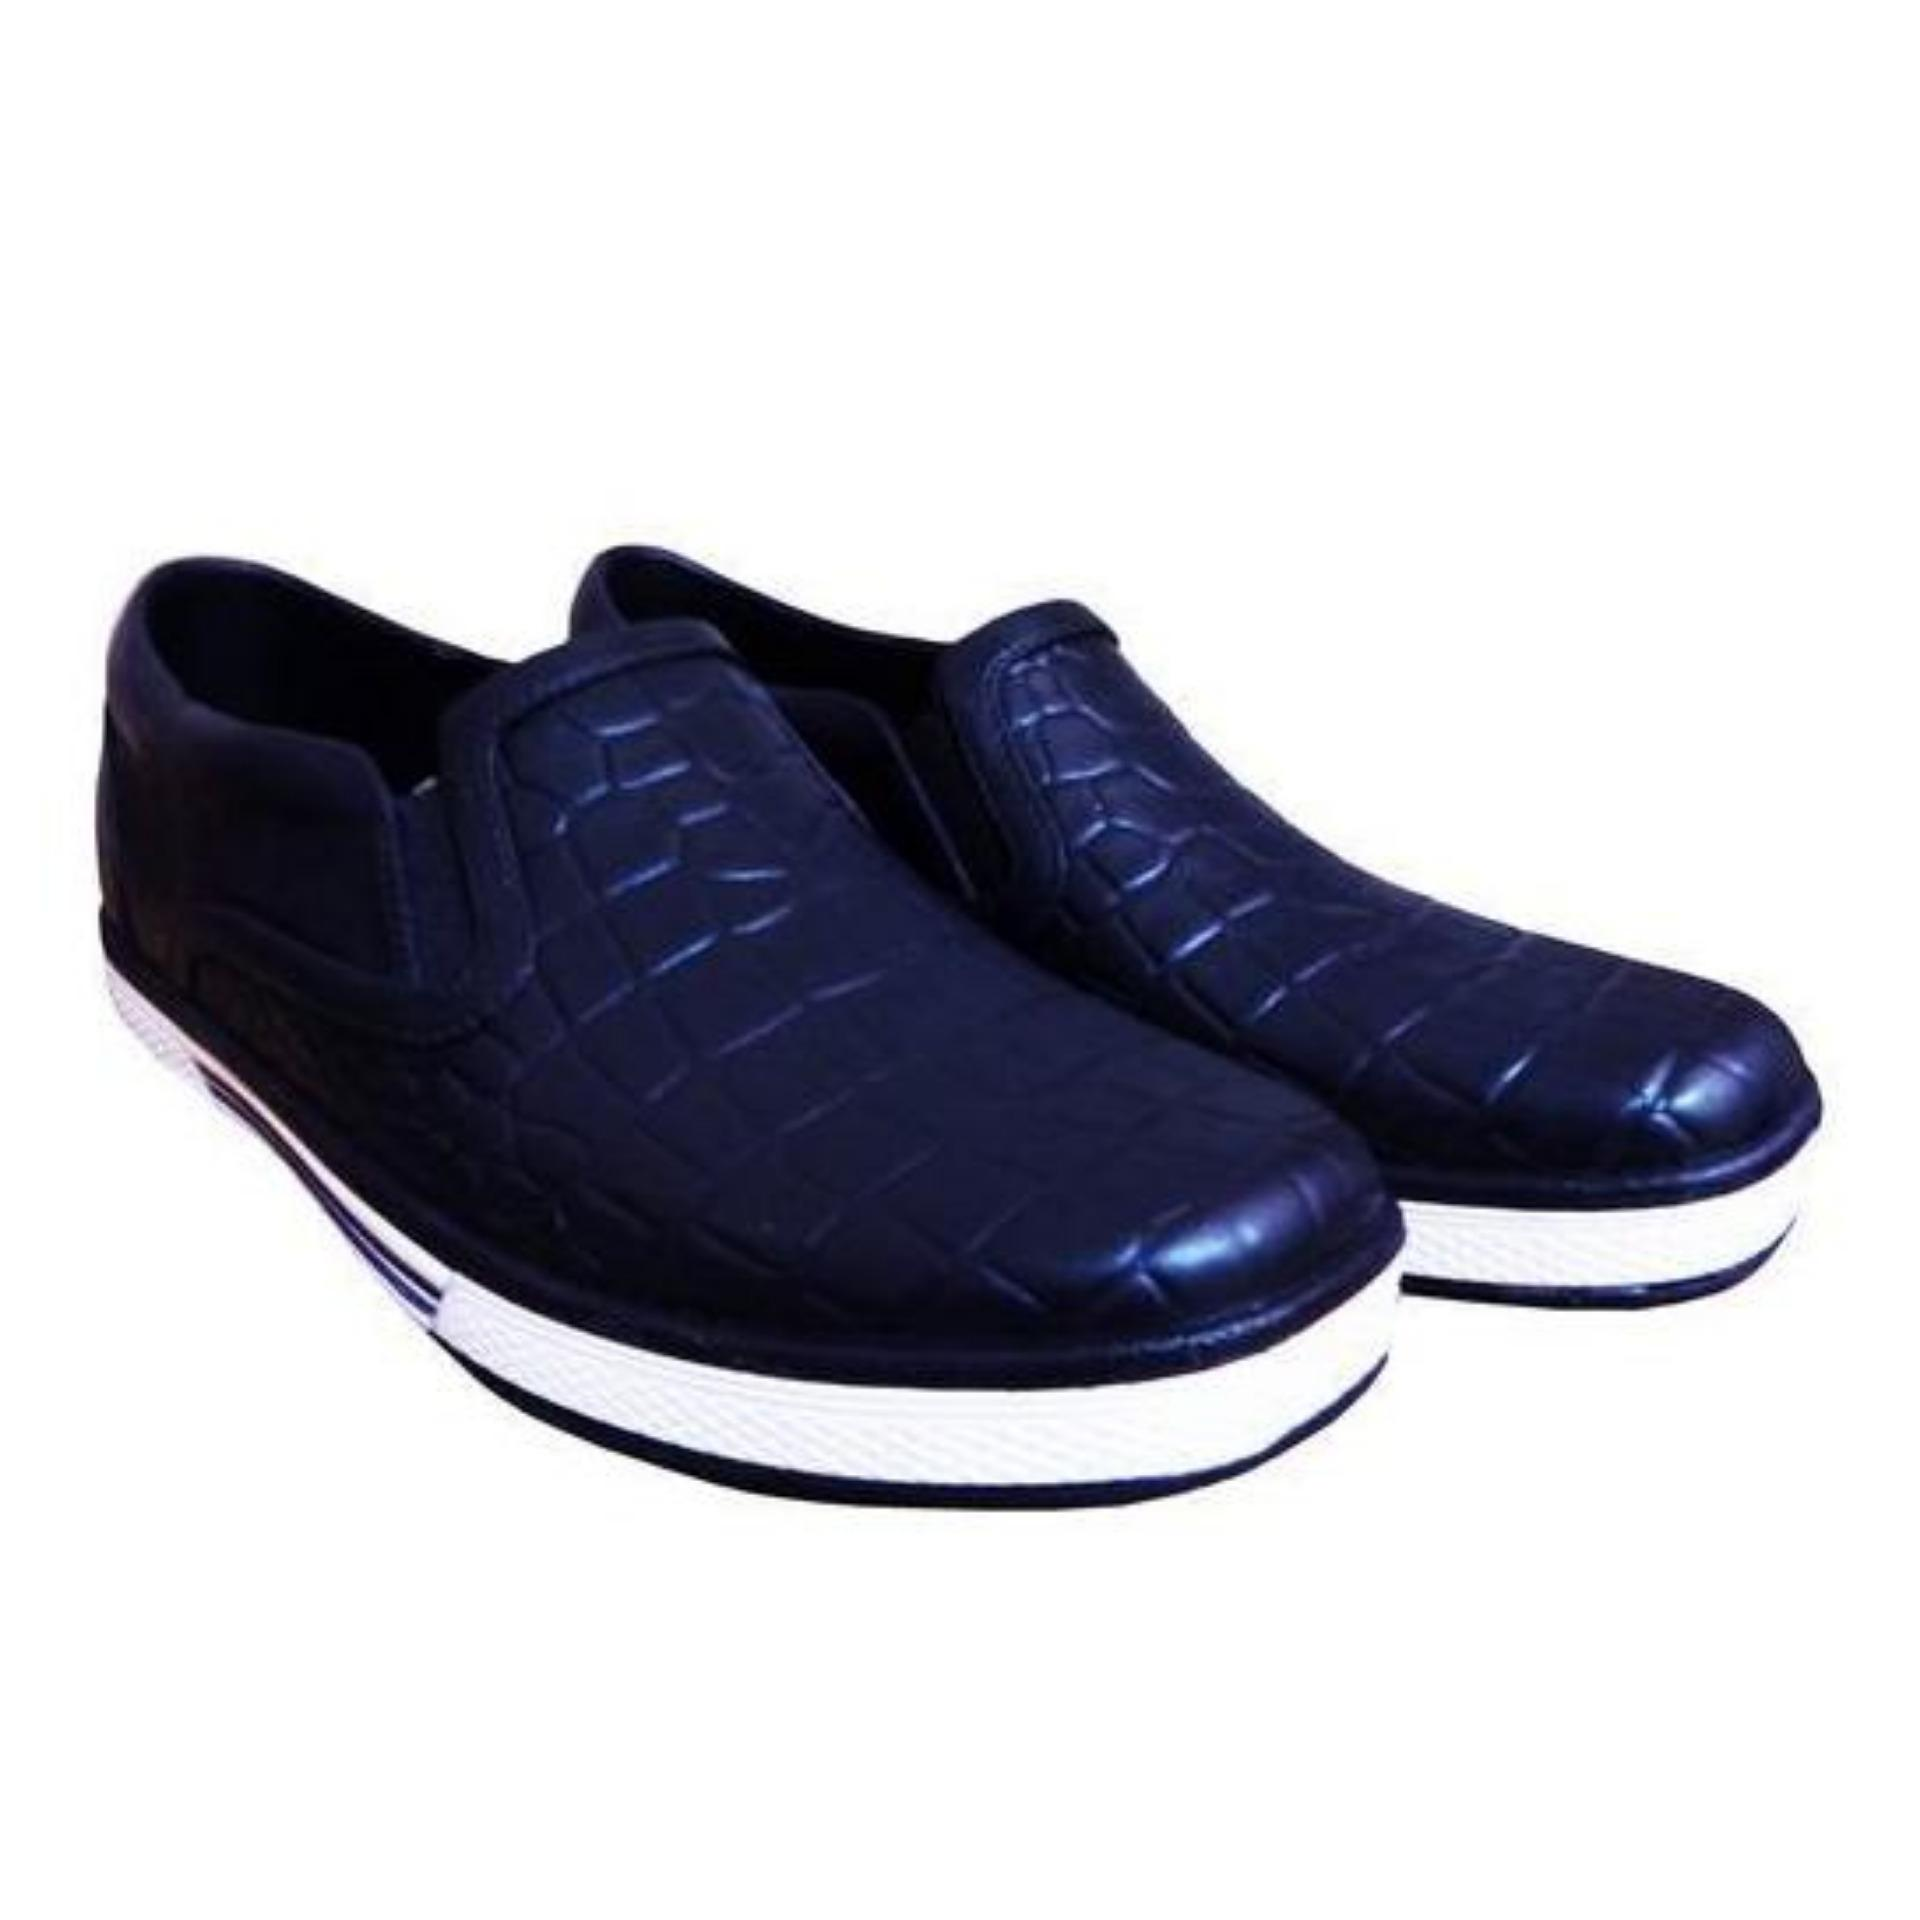 ATT Sepatu Pria BOS 1130 Biru Tua Slip On Sepatu Karet Motif KulitBuaya . e18501cb86